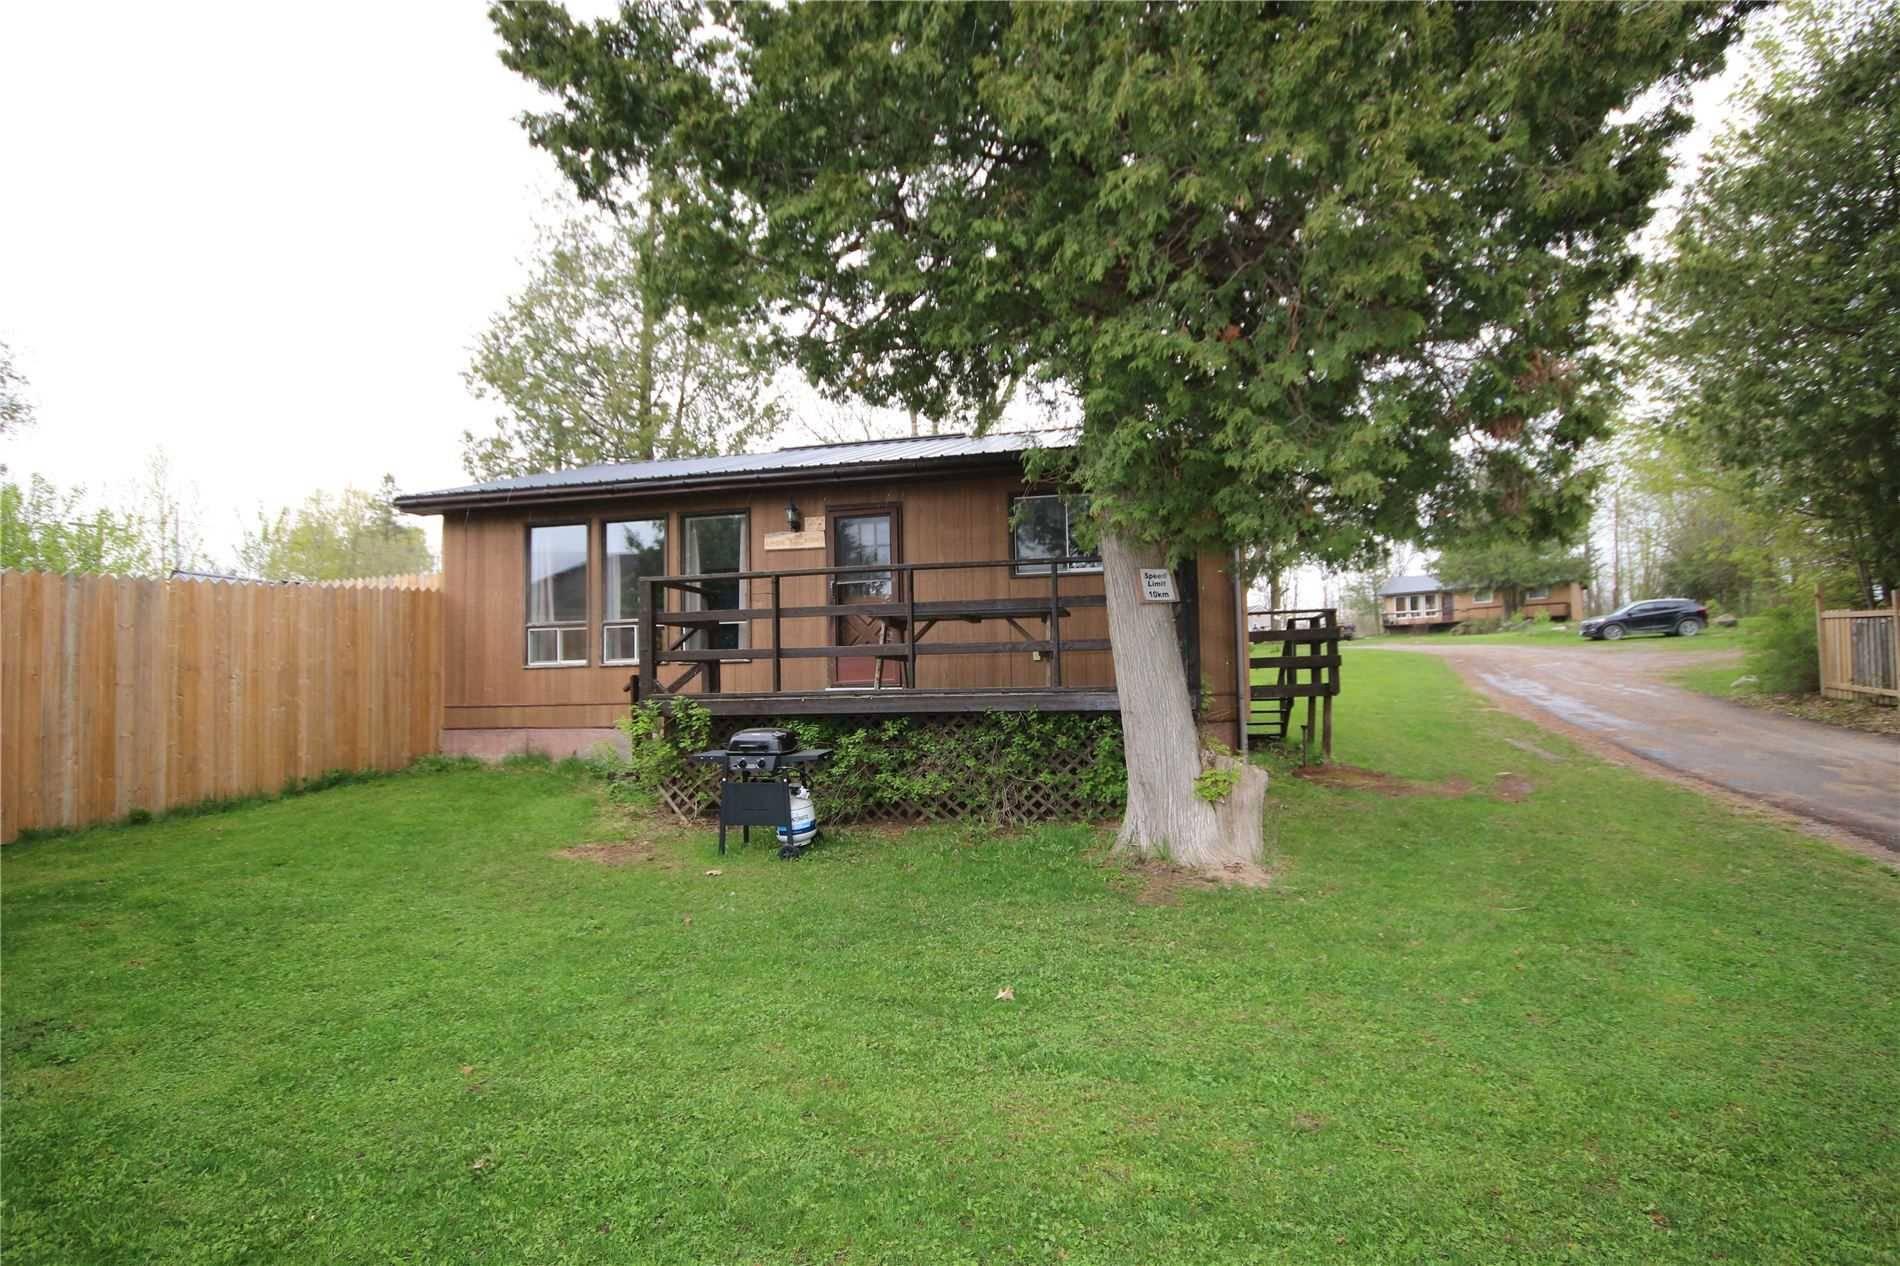 Buliding: 230 Lake Dalrymple Road, Kawartha Lakes, ON